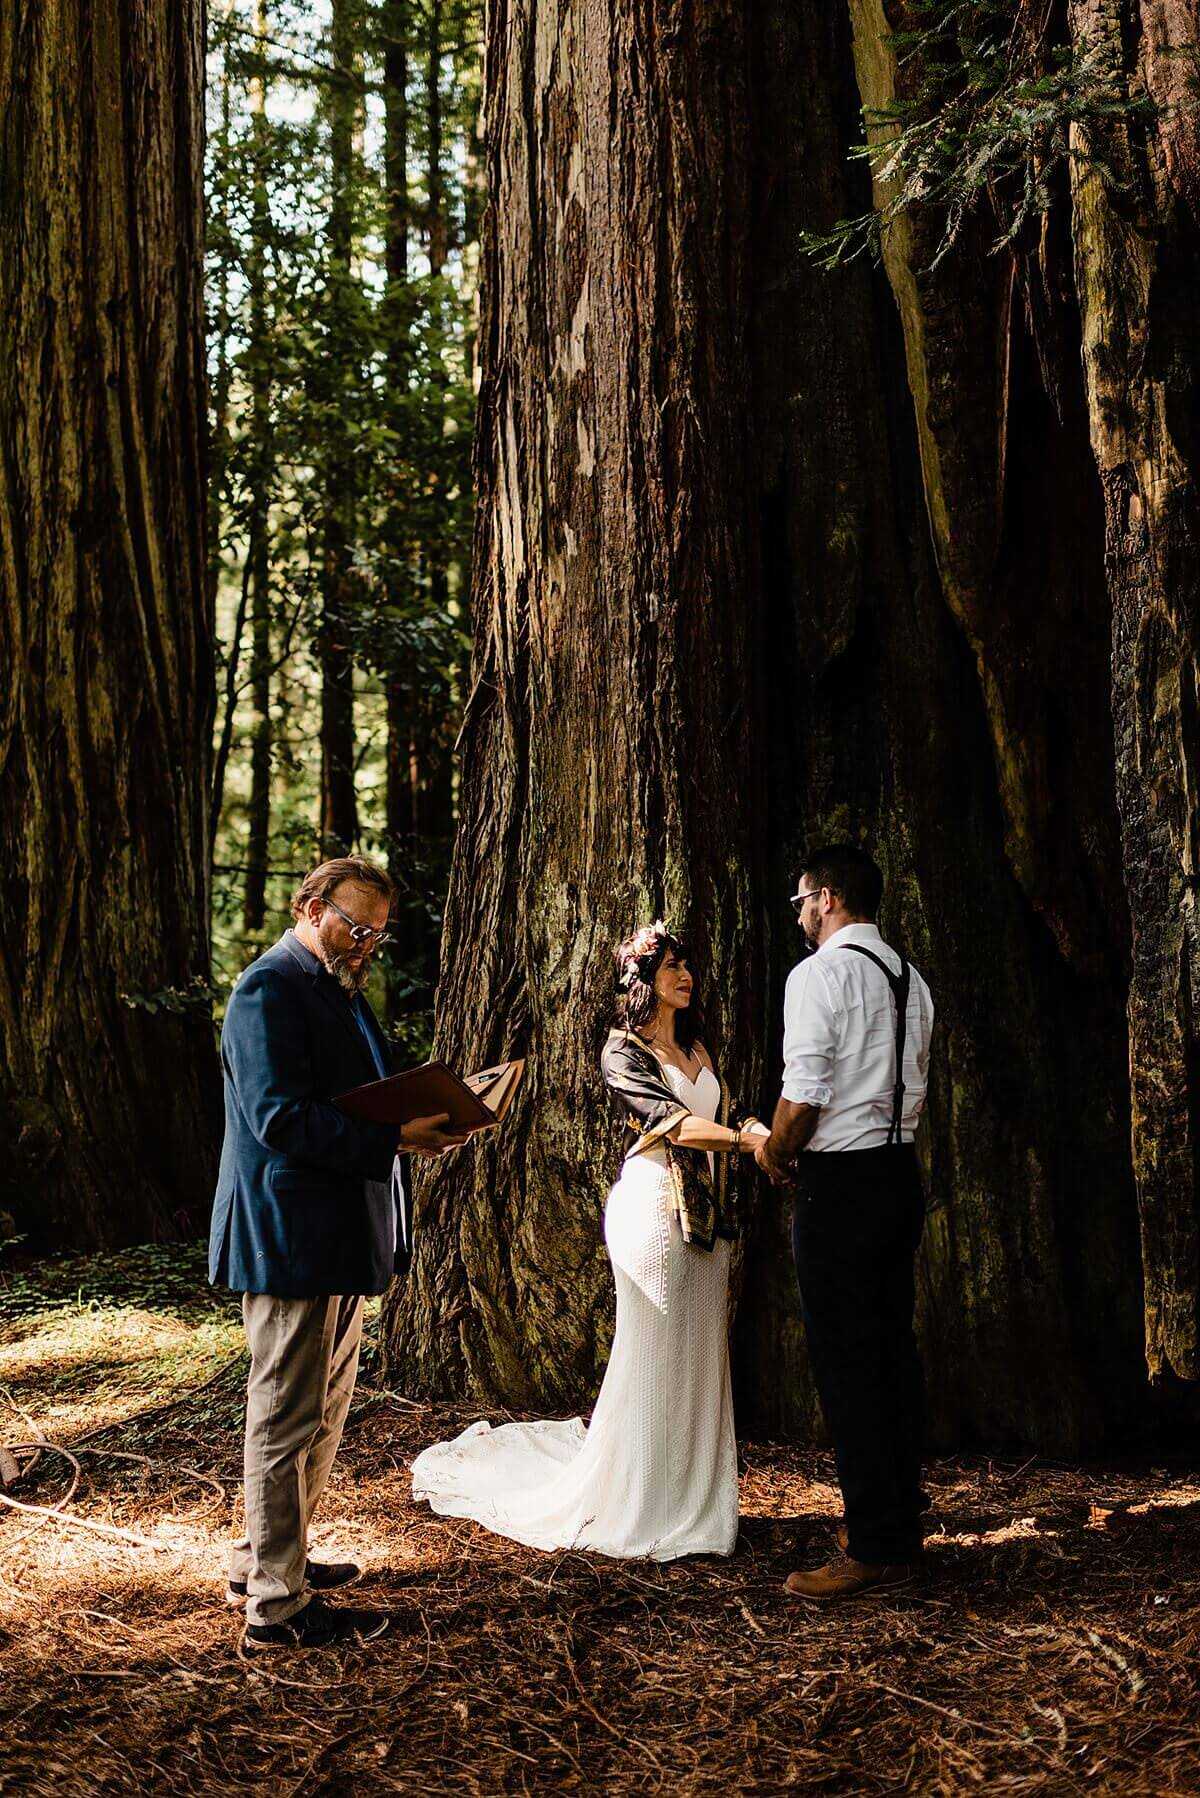 Allison-Brooks-Jedediah-Smiith-Redwoods-Adventure-Elopement-Wedding-S-Photography-Blog_0022.jpg